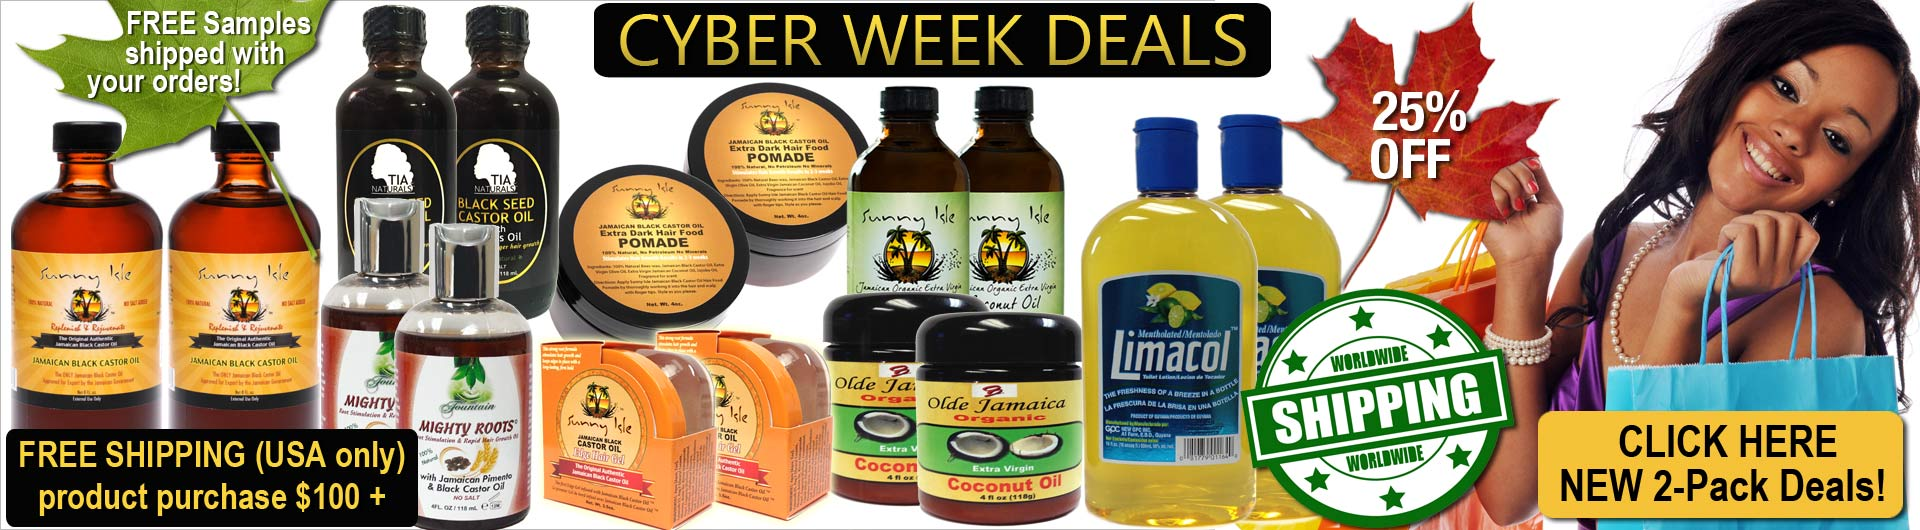 Cyber Deals continue at JamaicanOils